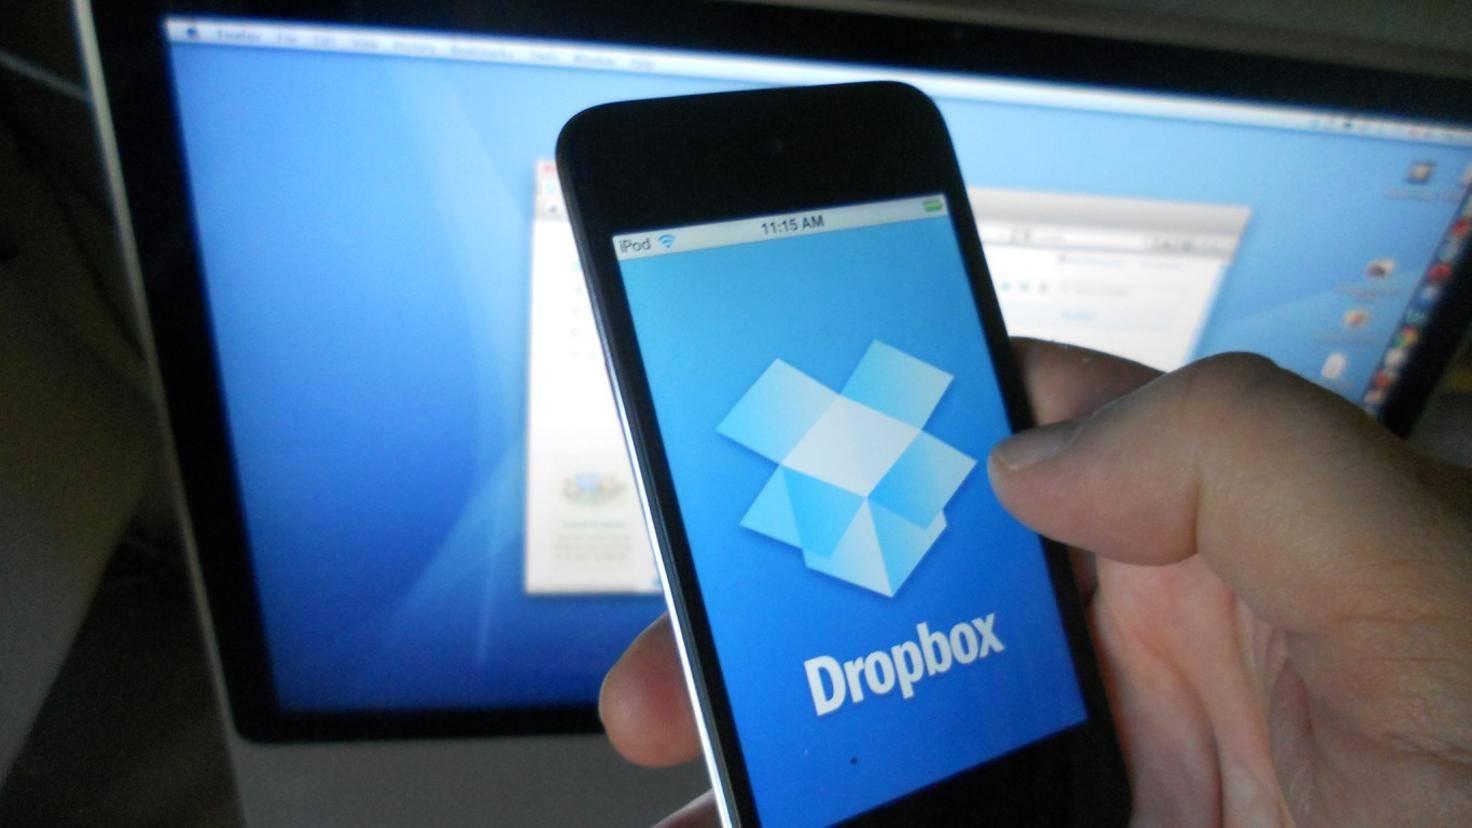 Dropbox flickr Ian Lamont